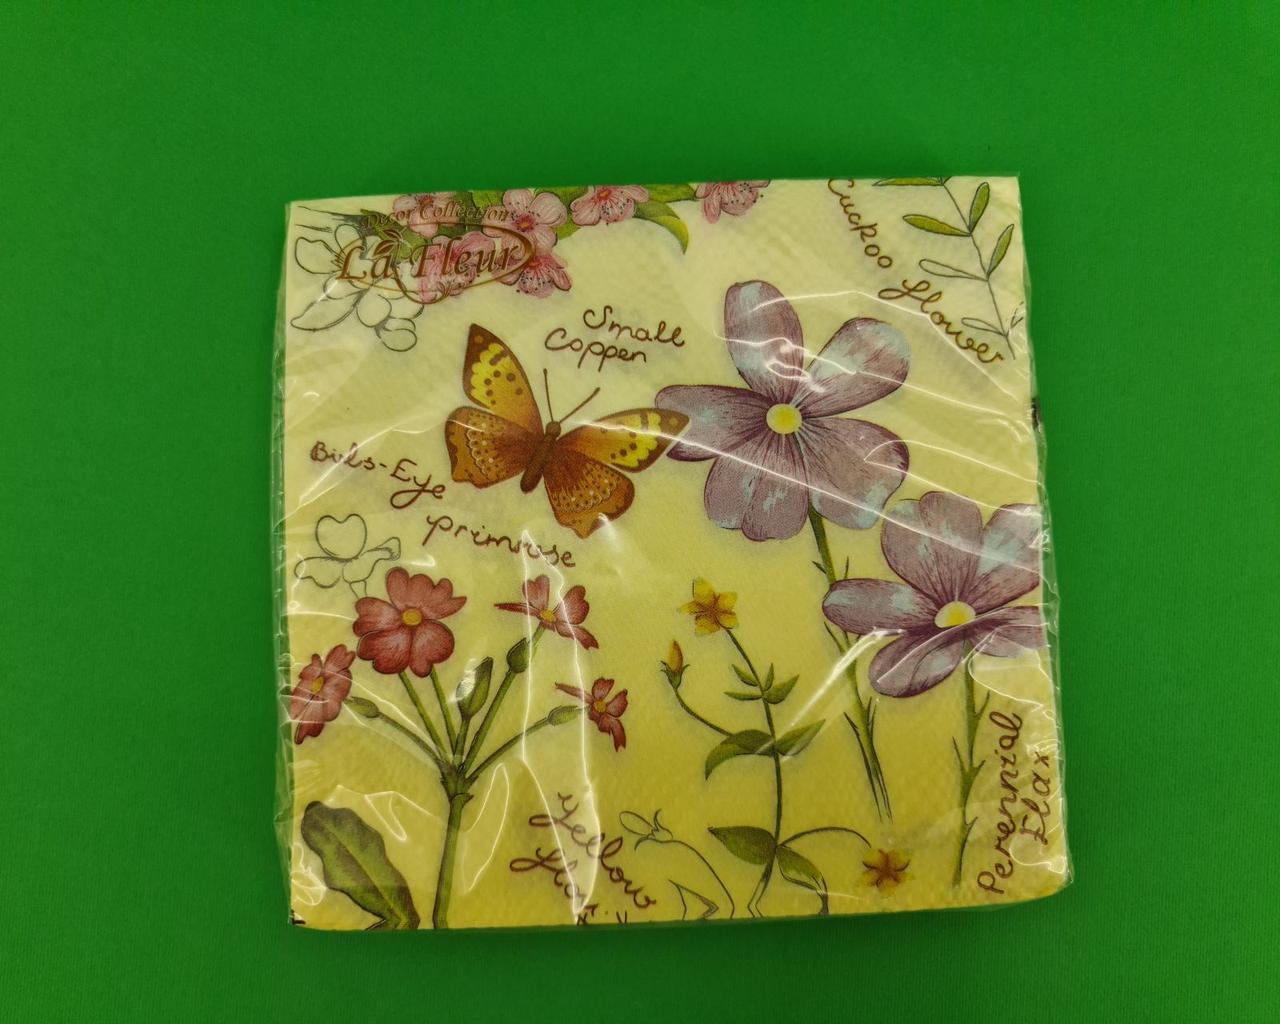 Гарна серветка (ЗЗхЗЗ, 20шт) La Fleur Солодкий аромат (1 пач.)